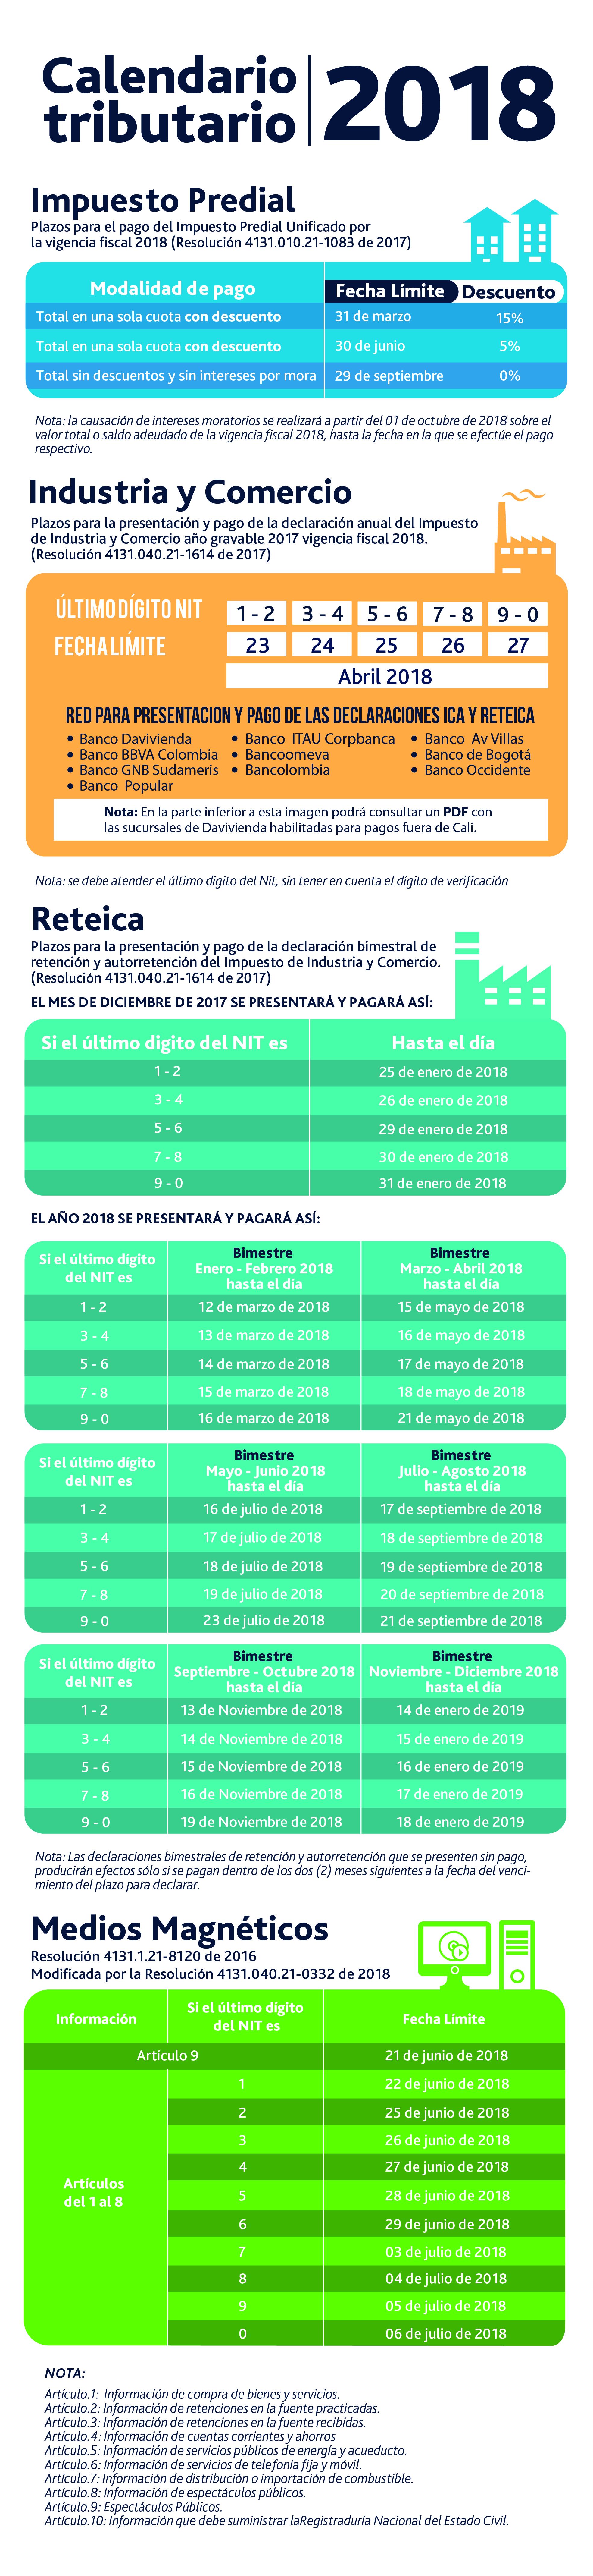 Calendario Impuestos 2020.Calendario Tributario 2018